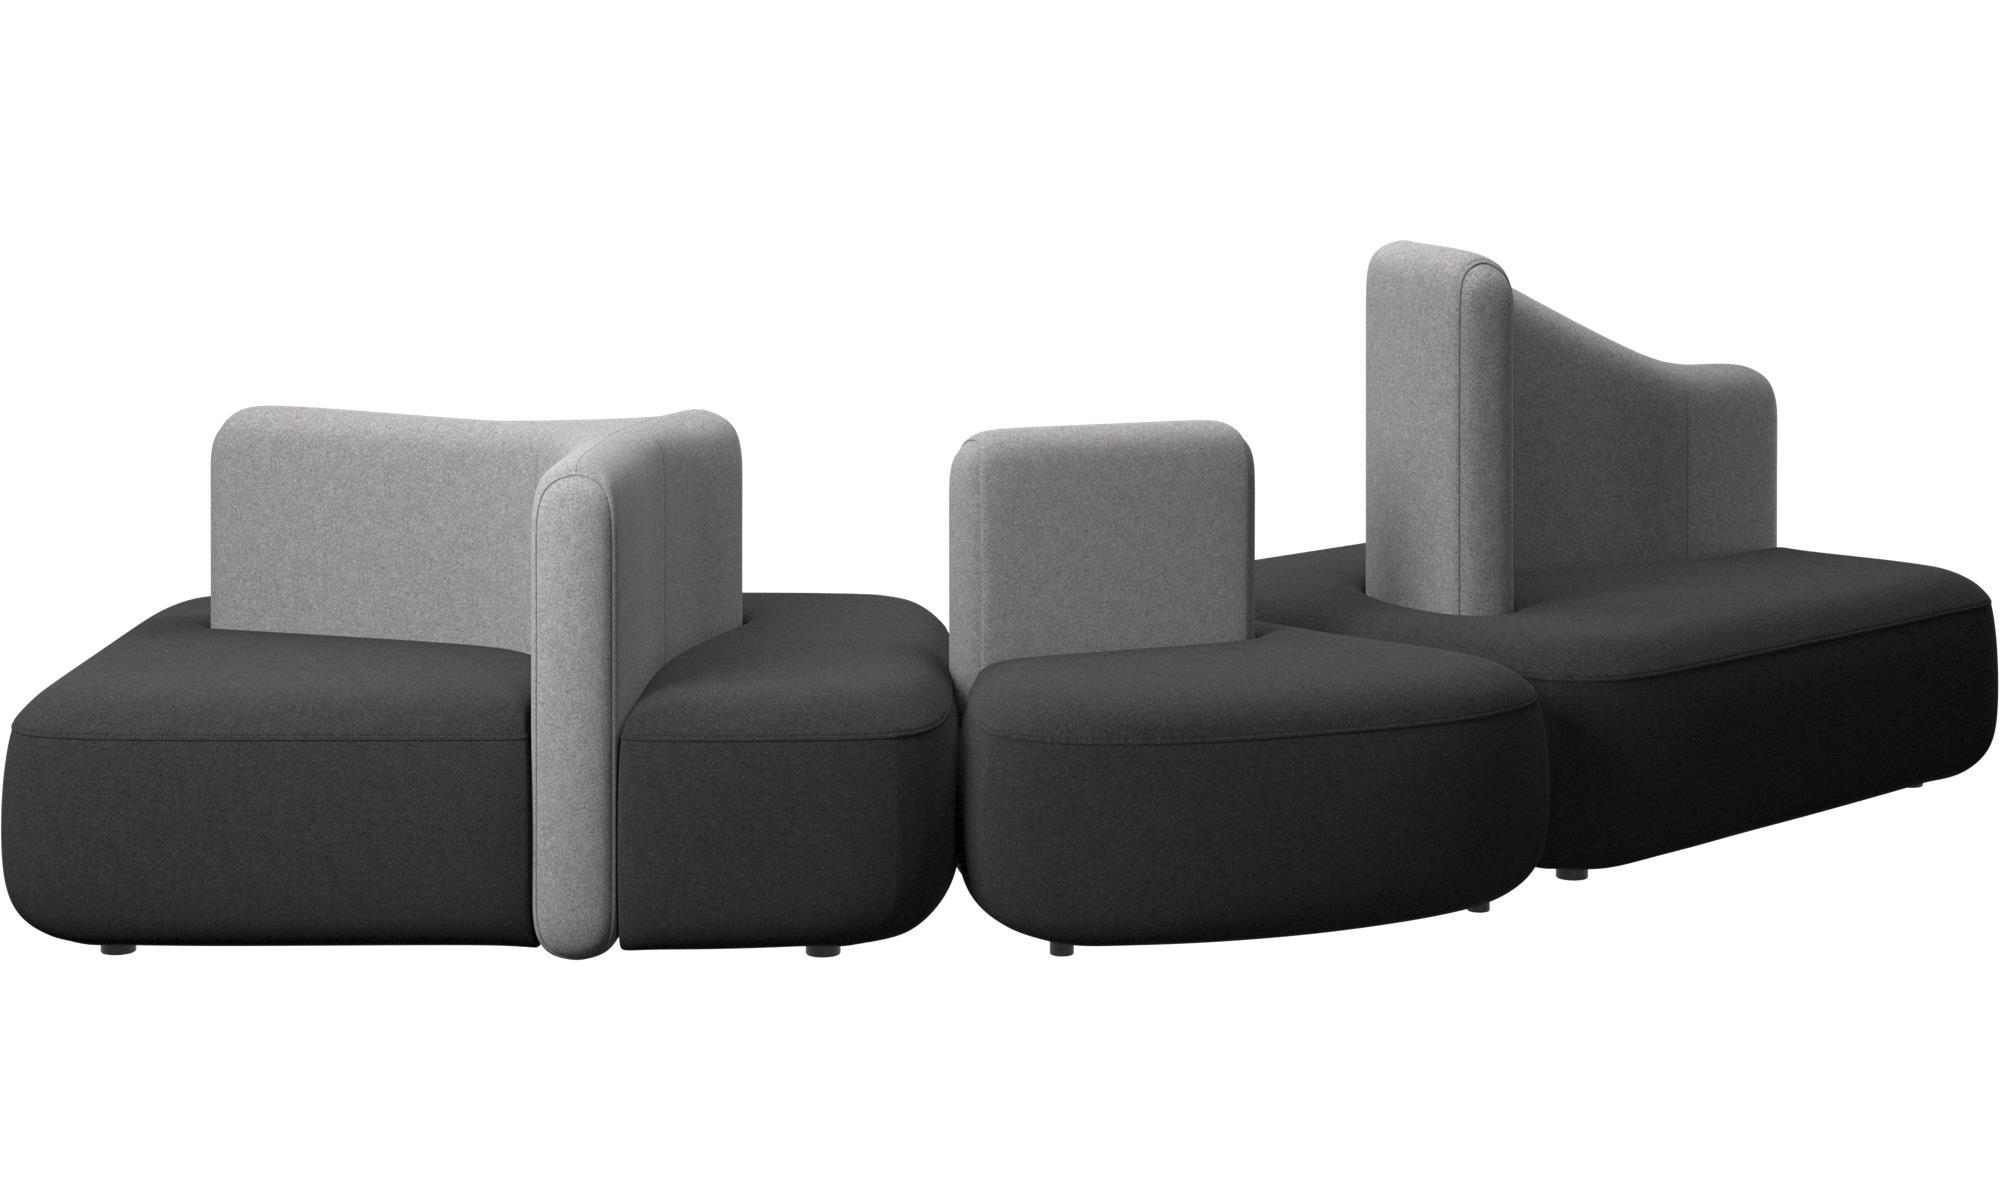 Astonishing Modular Sofas Ottawa Sofa Boconcept Machost Co Dining Chair Design Ideas Machostcouk